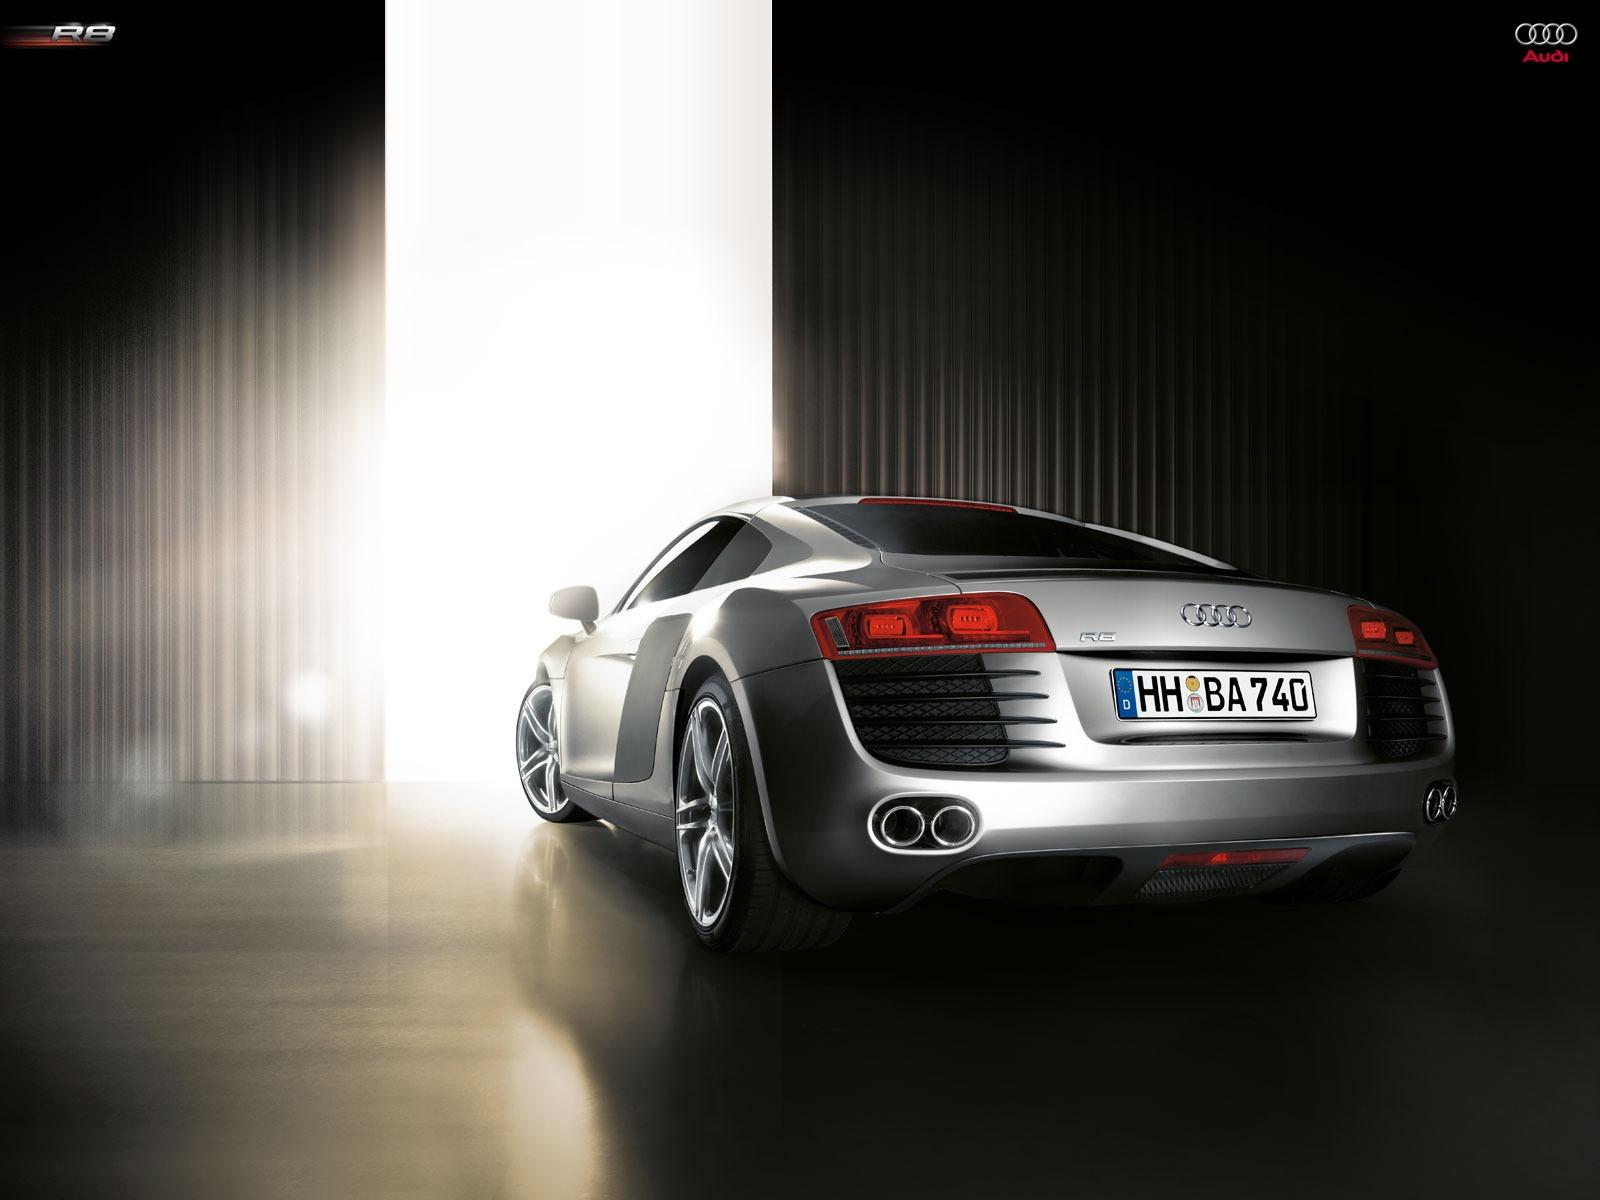 Audi R8 Rear Wallpaper Audi Cars Wallpapers In Jpg Format For Free